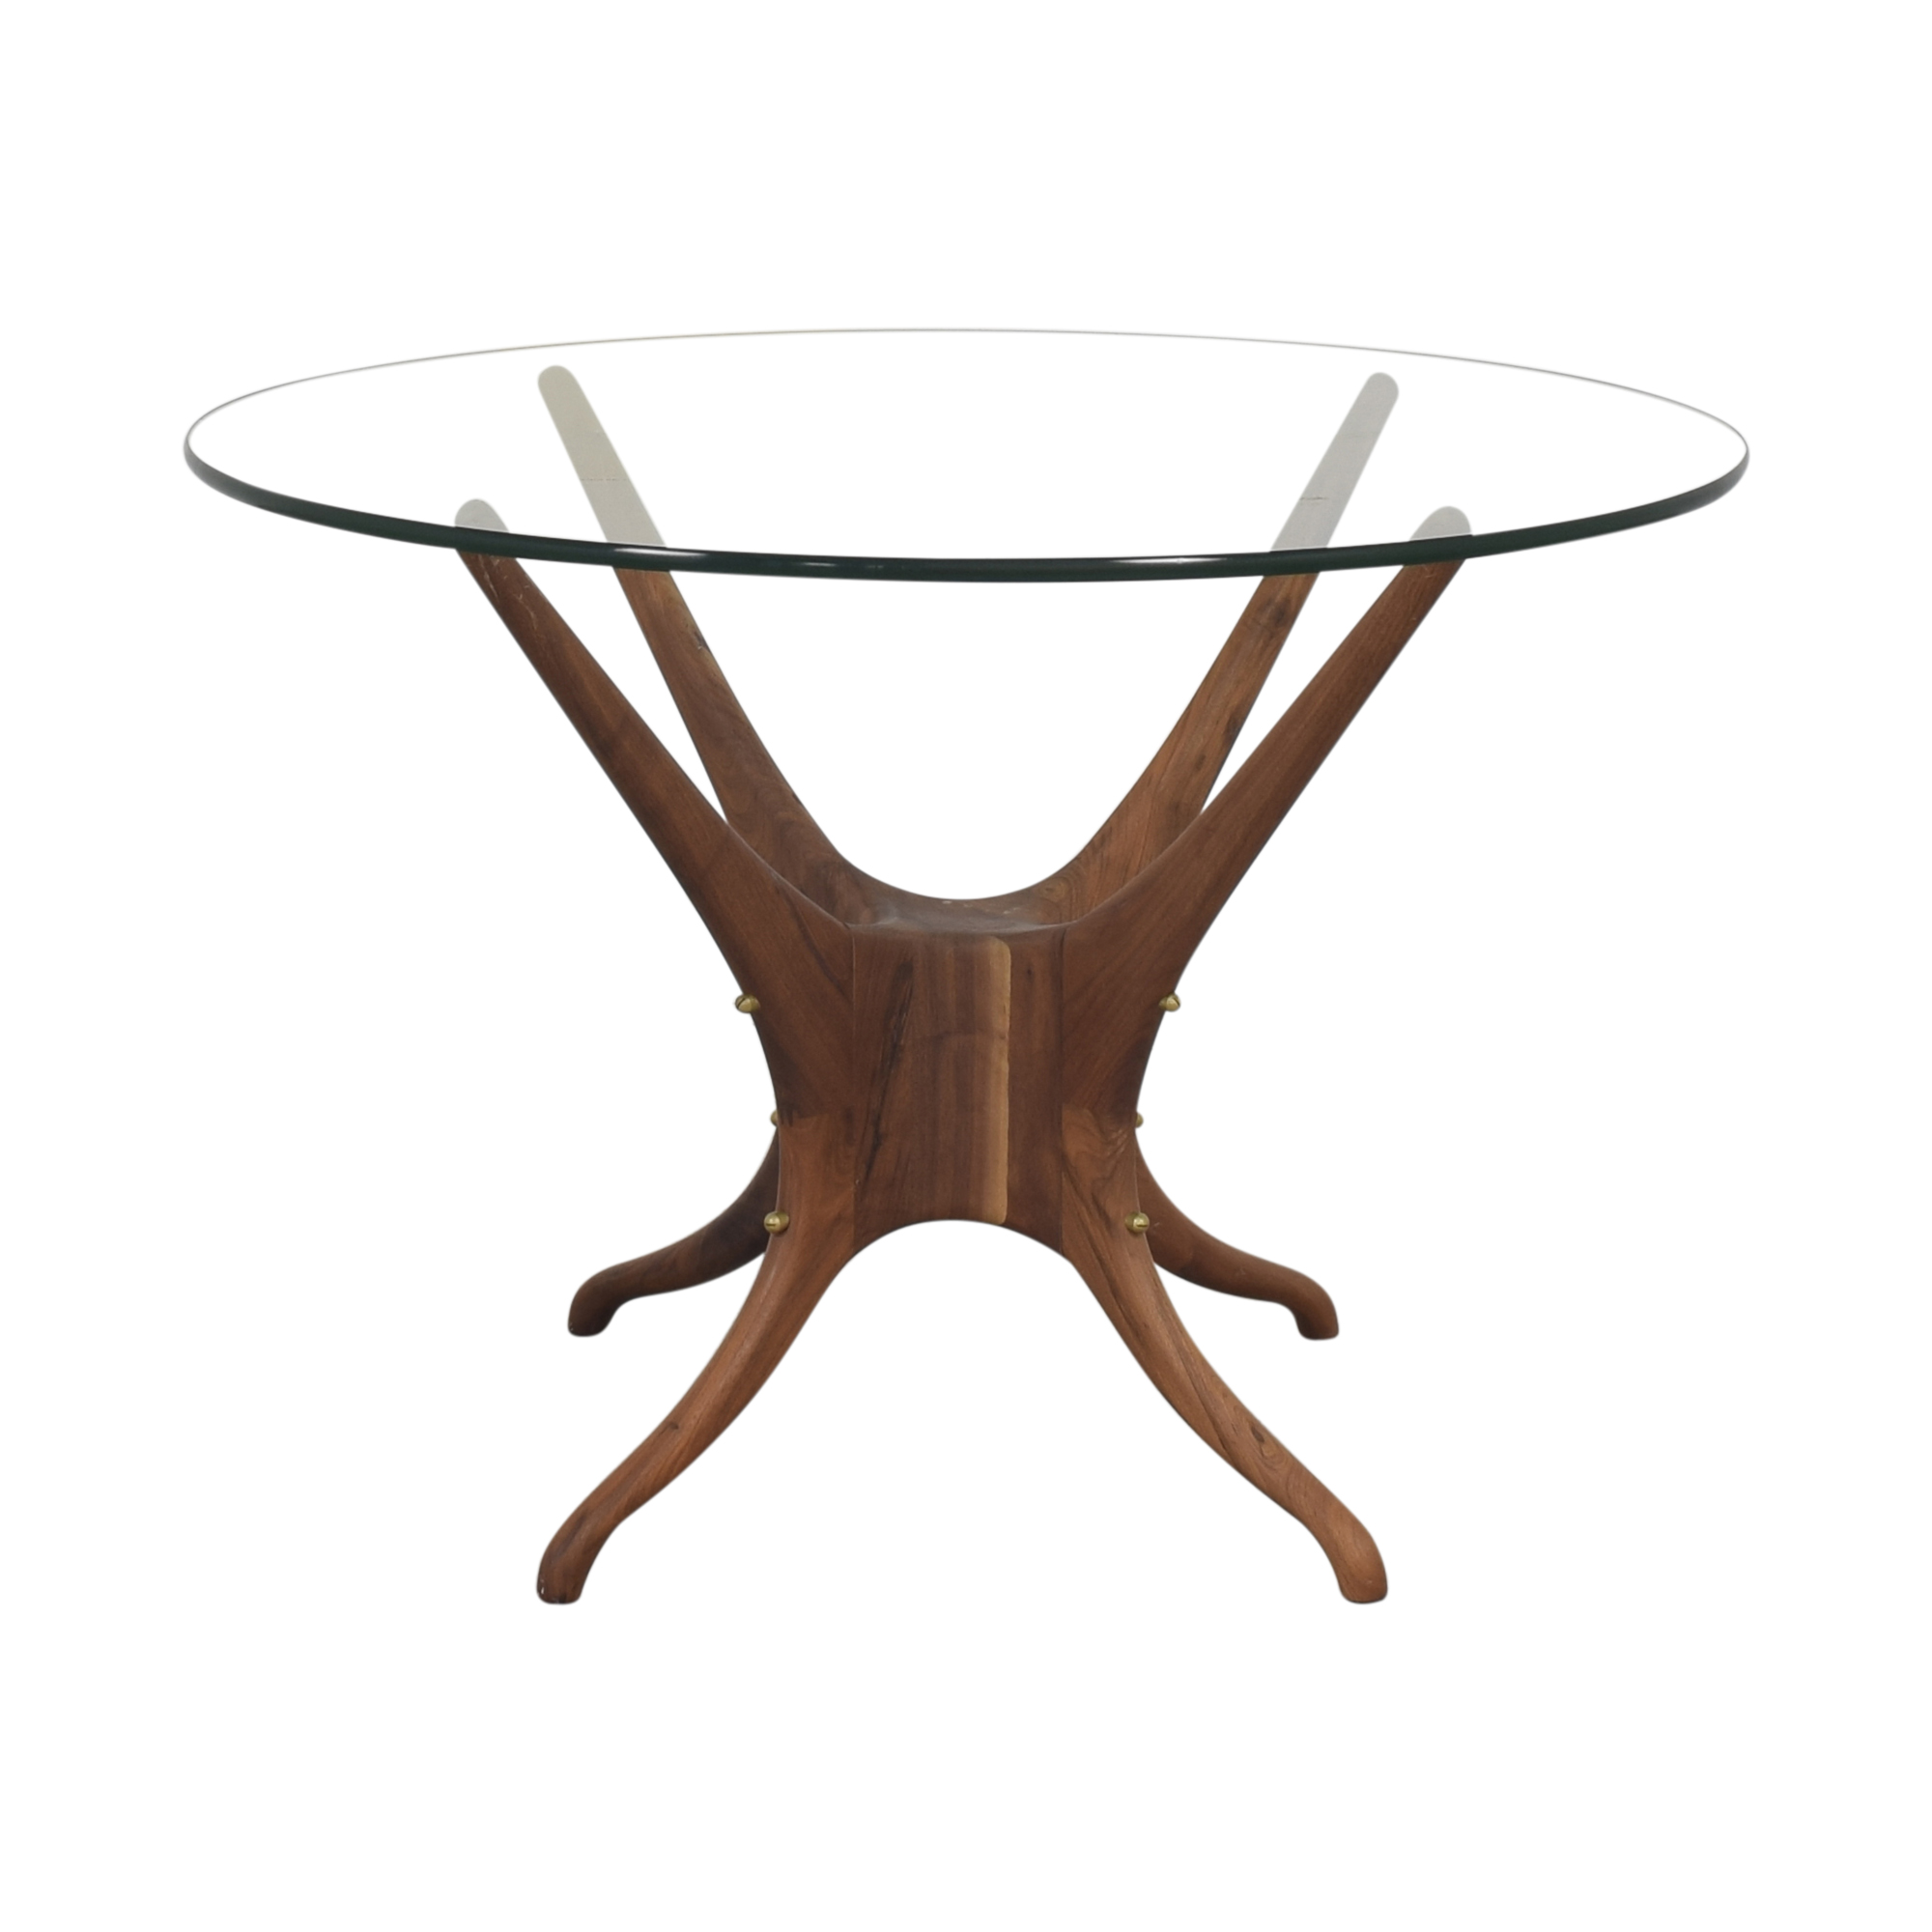 Organic Modernism Organic Modernism Okto Round Dining Table used